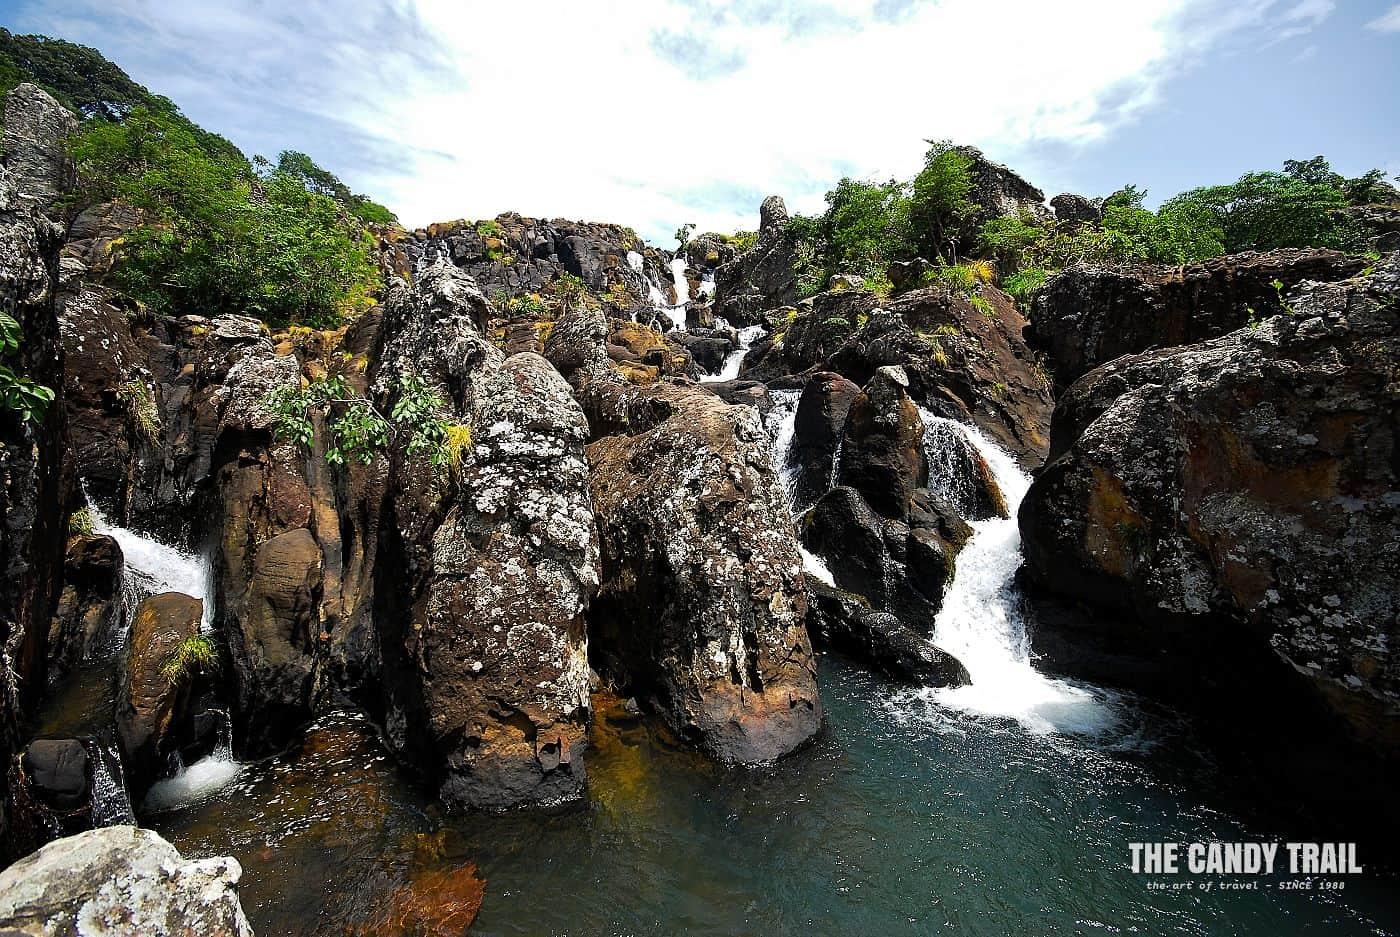 waterfall doucki fouta djallon guinea